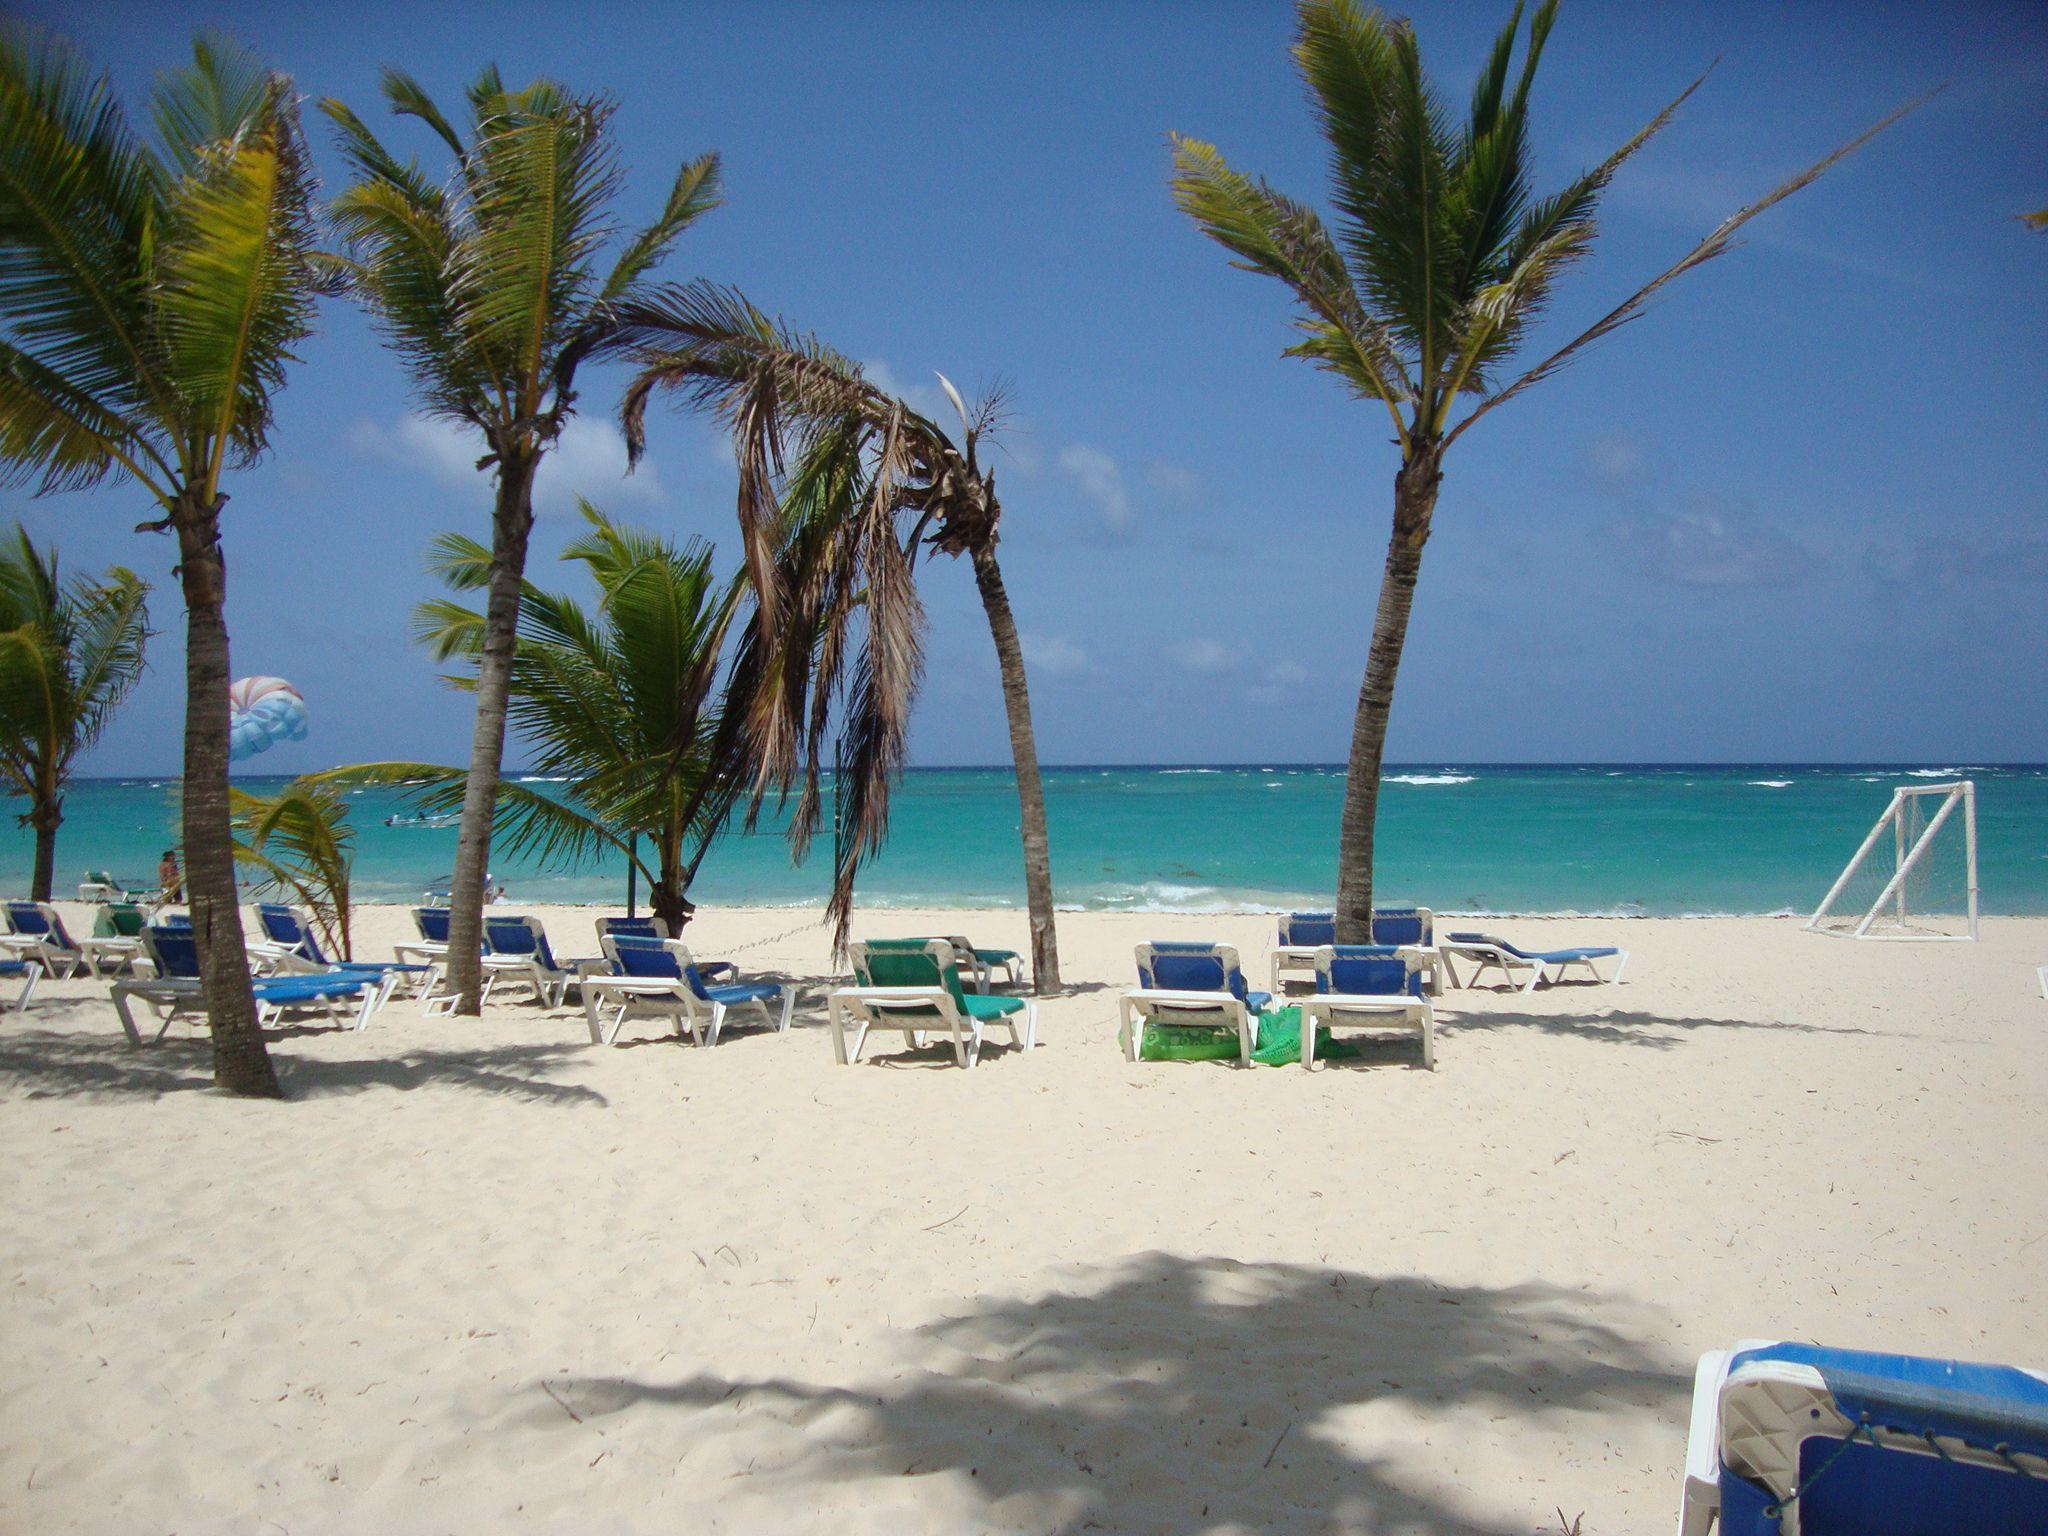 dominican republic punta cana island time pinterest. Black Bedroom Furniture Sets. Home Design Ideas